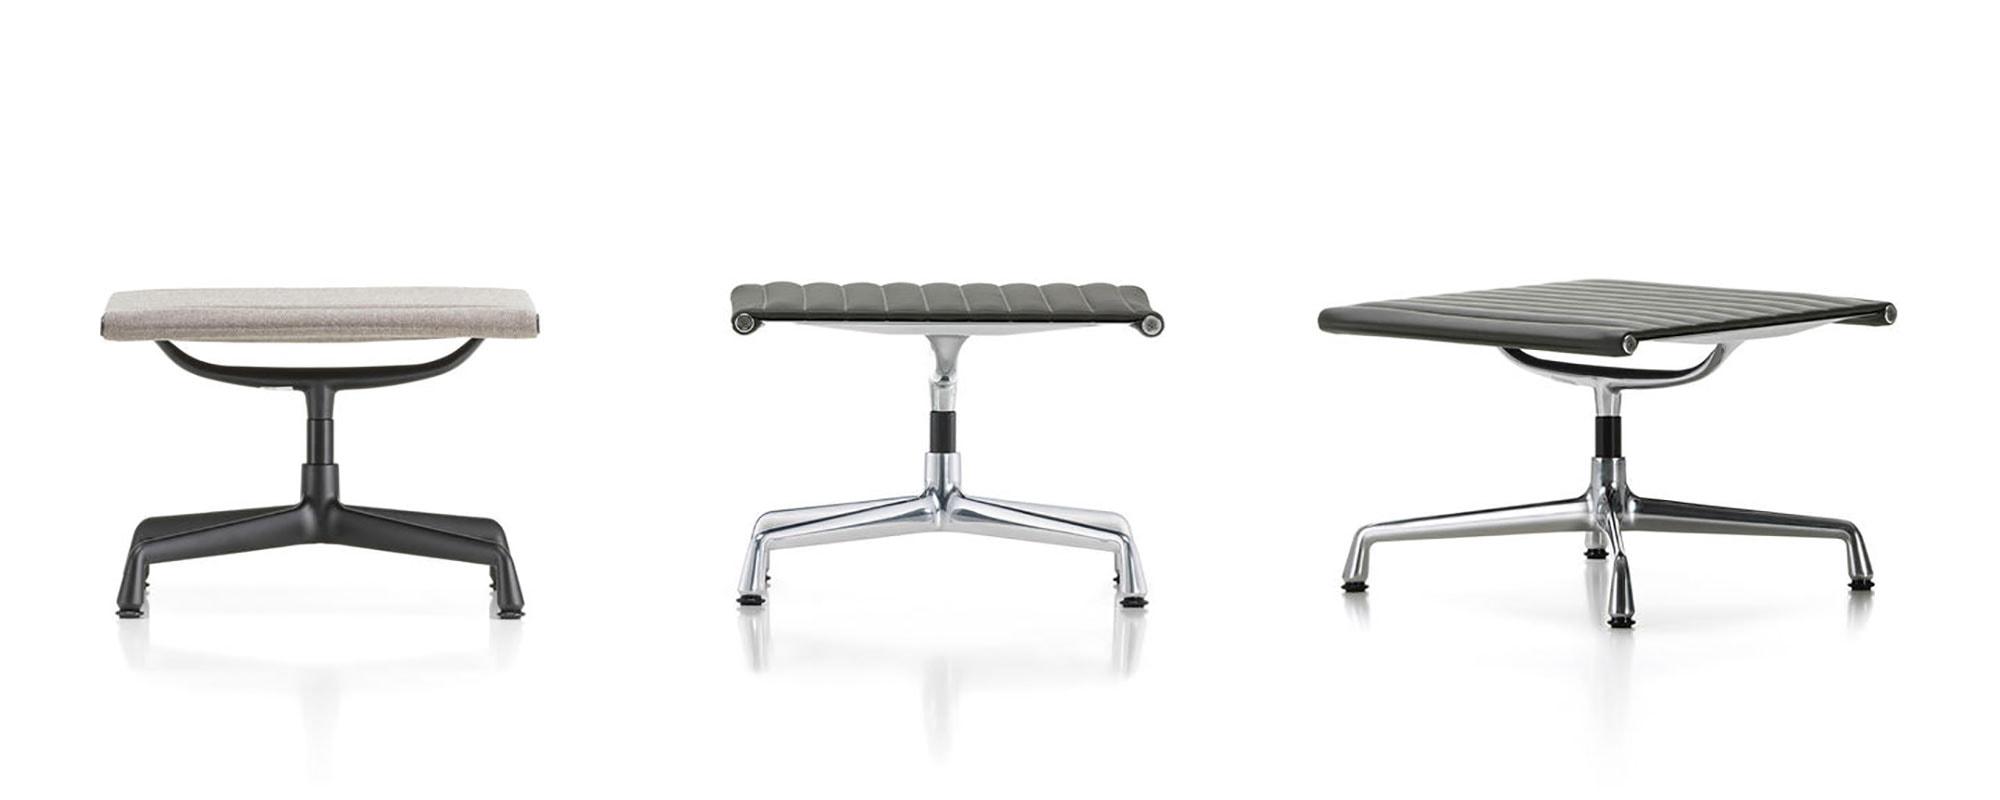 VITRA Aluminium-chair EA124 EA125 gallery 2